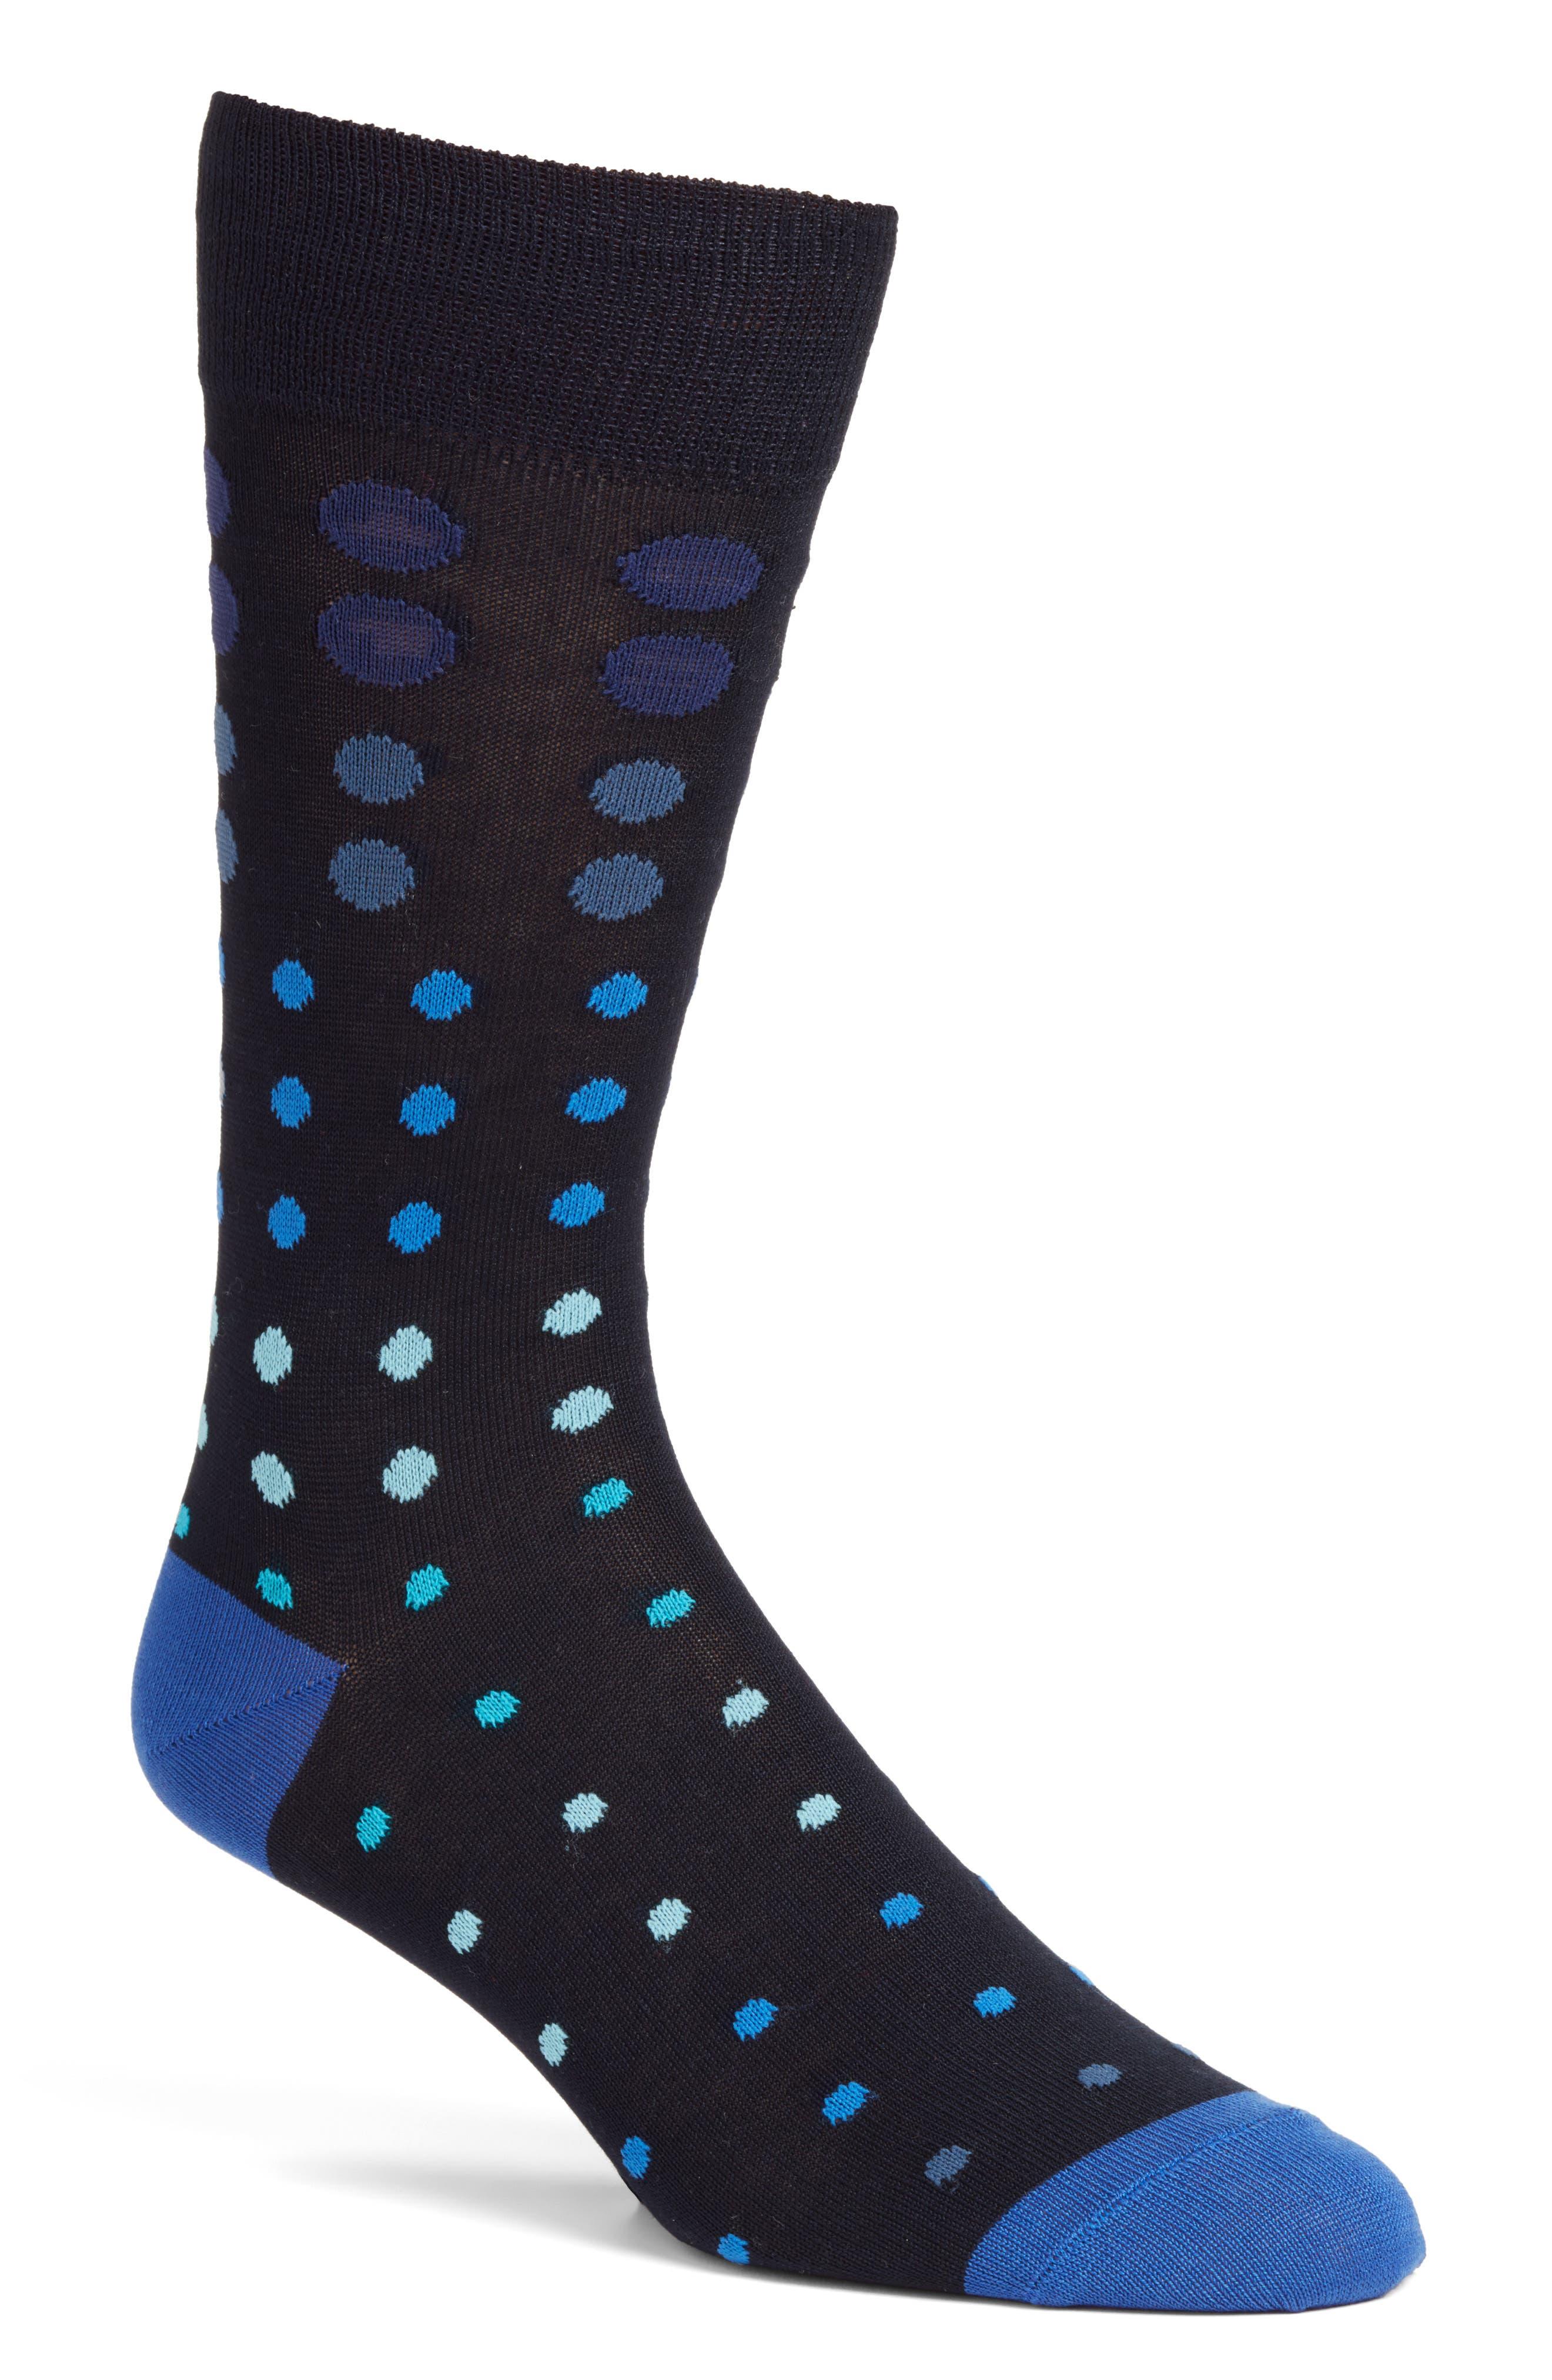 Paul Smith Gradient Spot Crew Socks